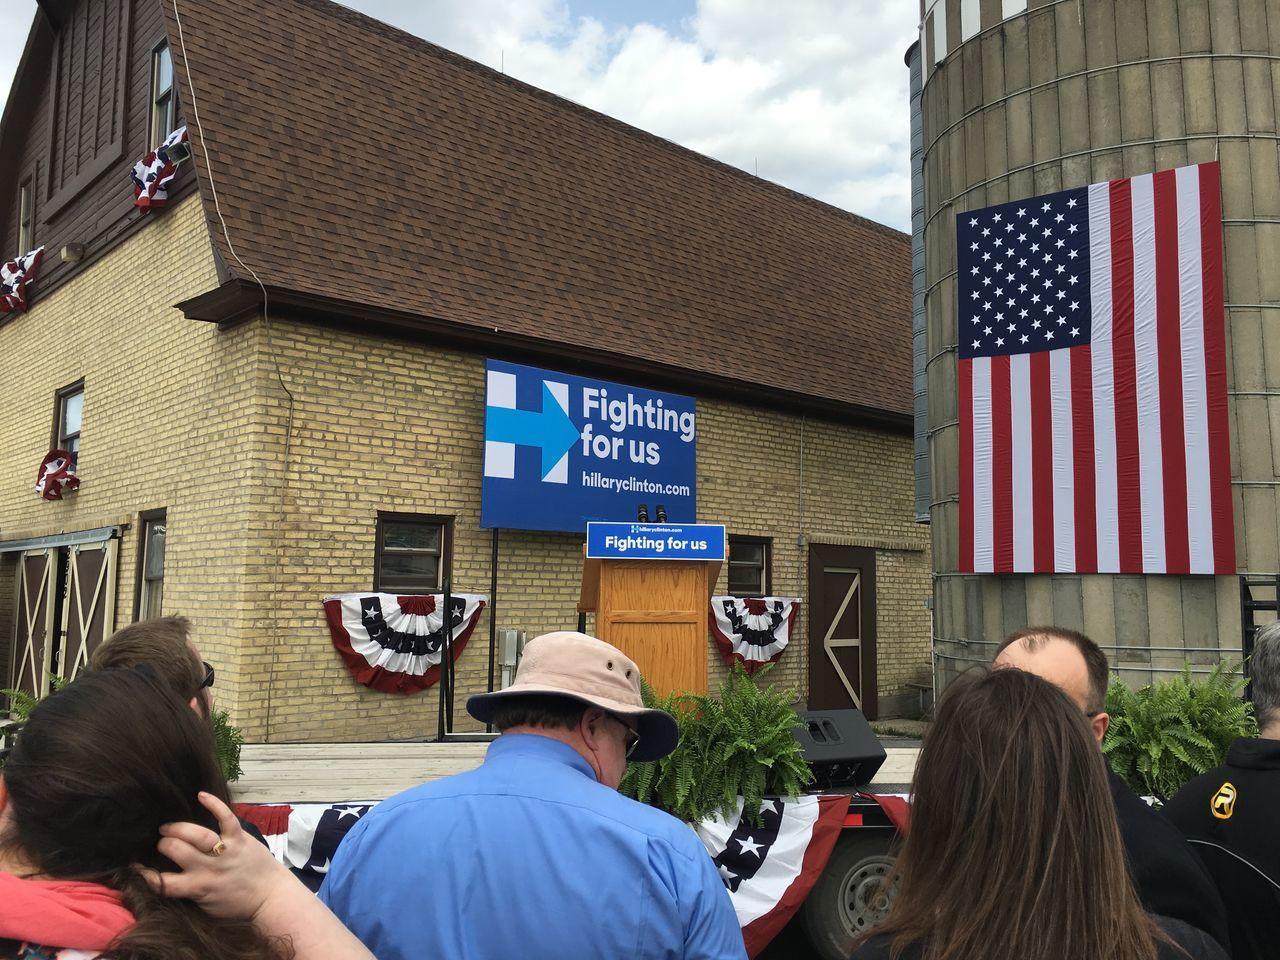 May 20, 2016 / Bill Clinton at Rheault Farm Bill Clinton Day Election Fargo North Dakota Outdoors Politics President Presidential Campaign 2016 Presidential Election 2016 Rheault Farm